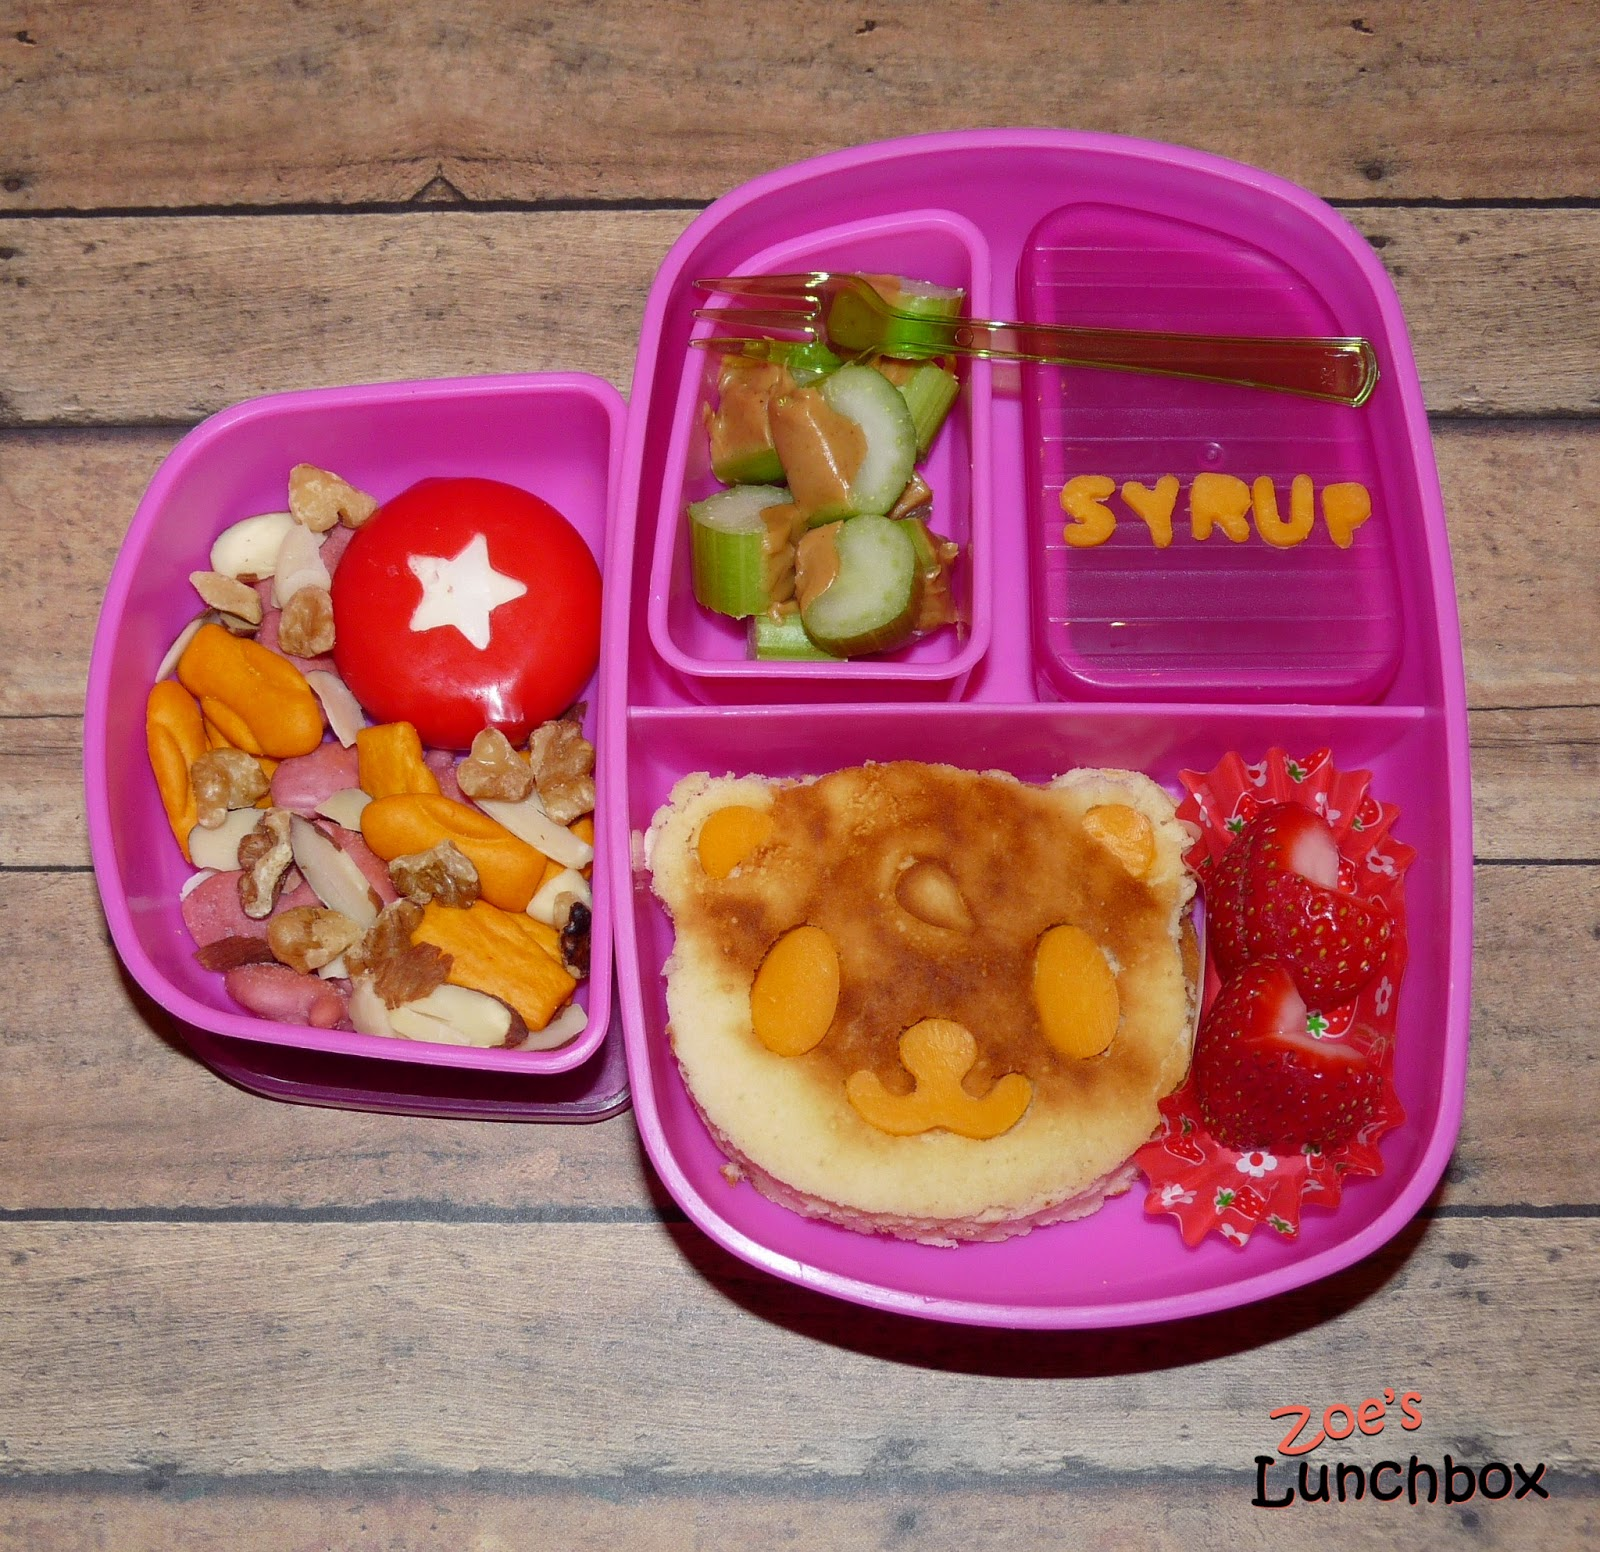 Sassy bento lunch